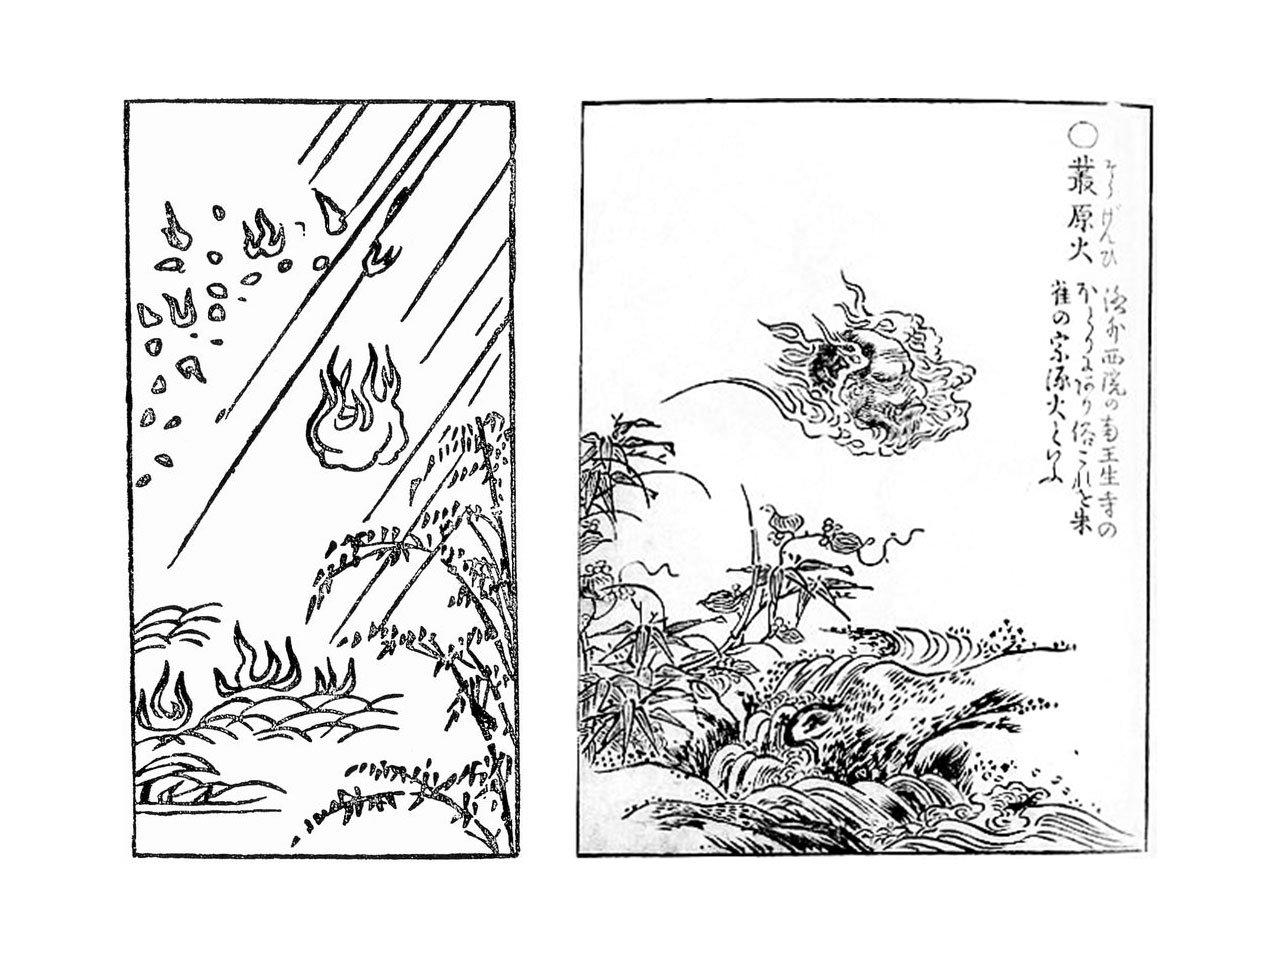 Onibi skull flame japanese creature